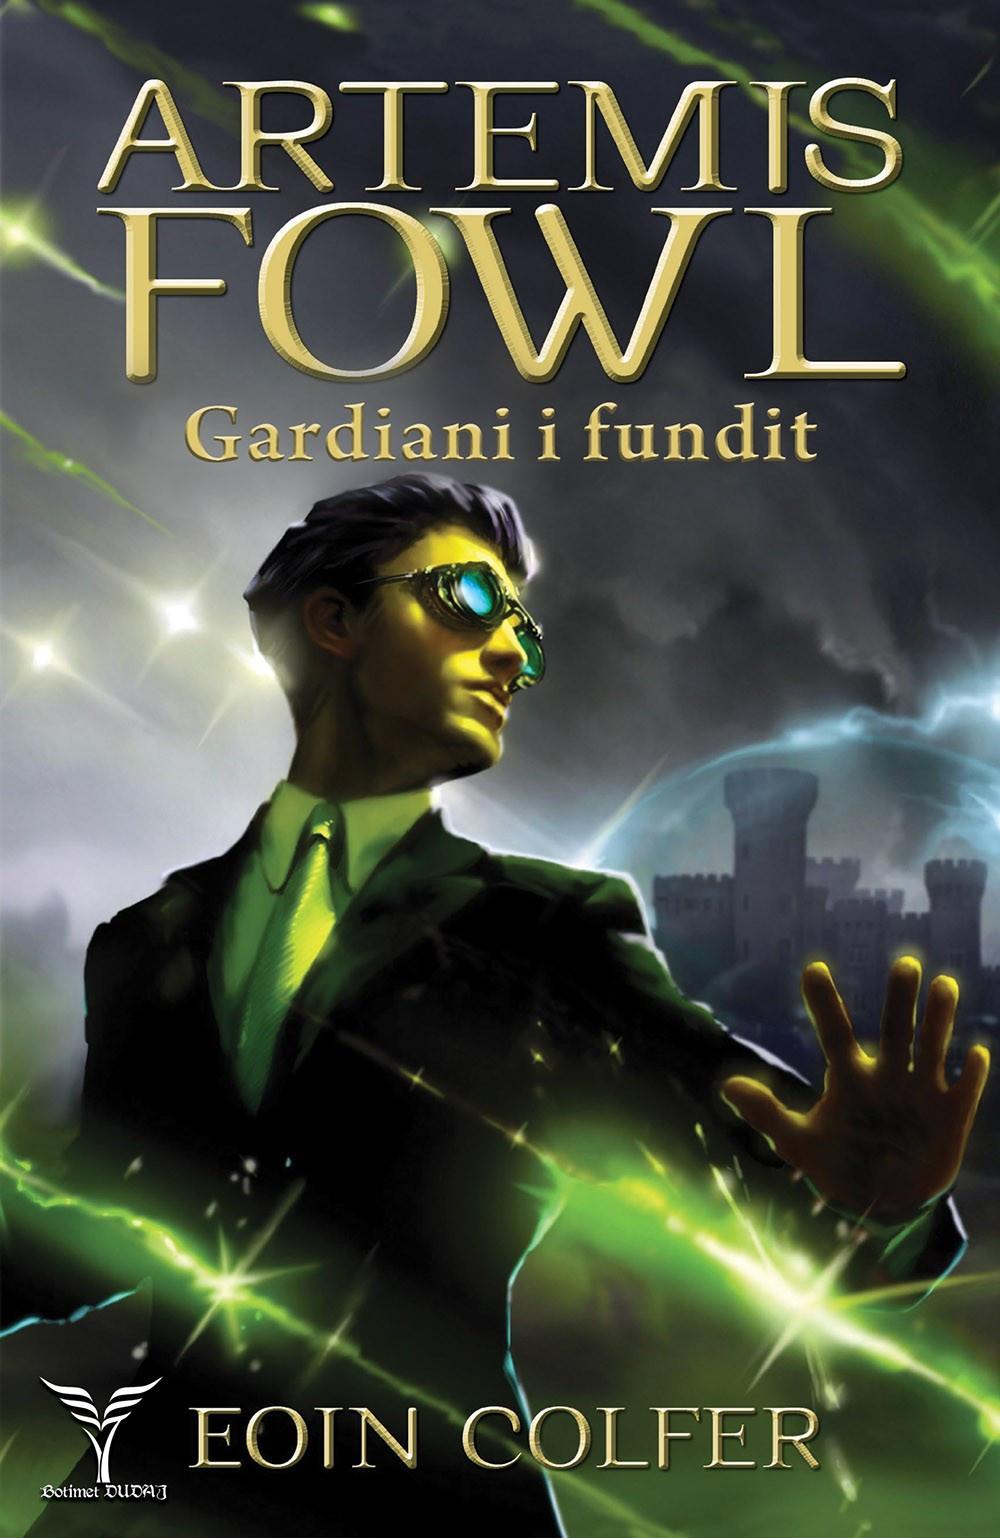 Artemis Fowl 8 - Gardiani i fundit